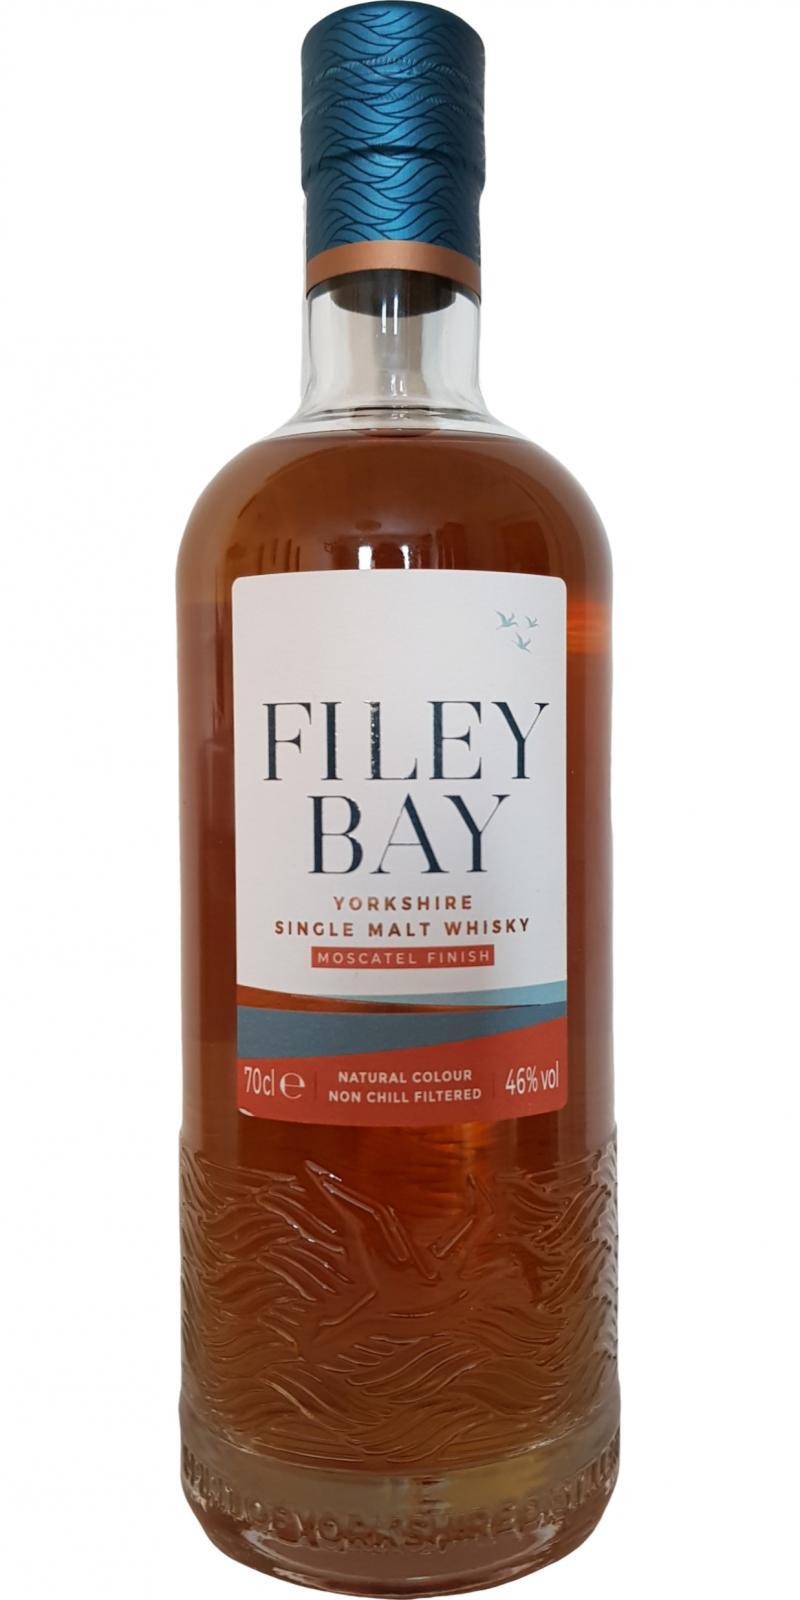 Filey Bay Yorkshire Single Malt Whisky